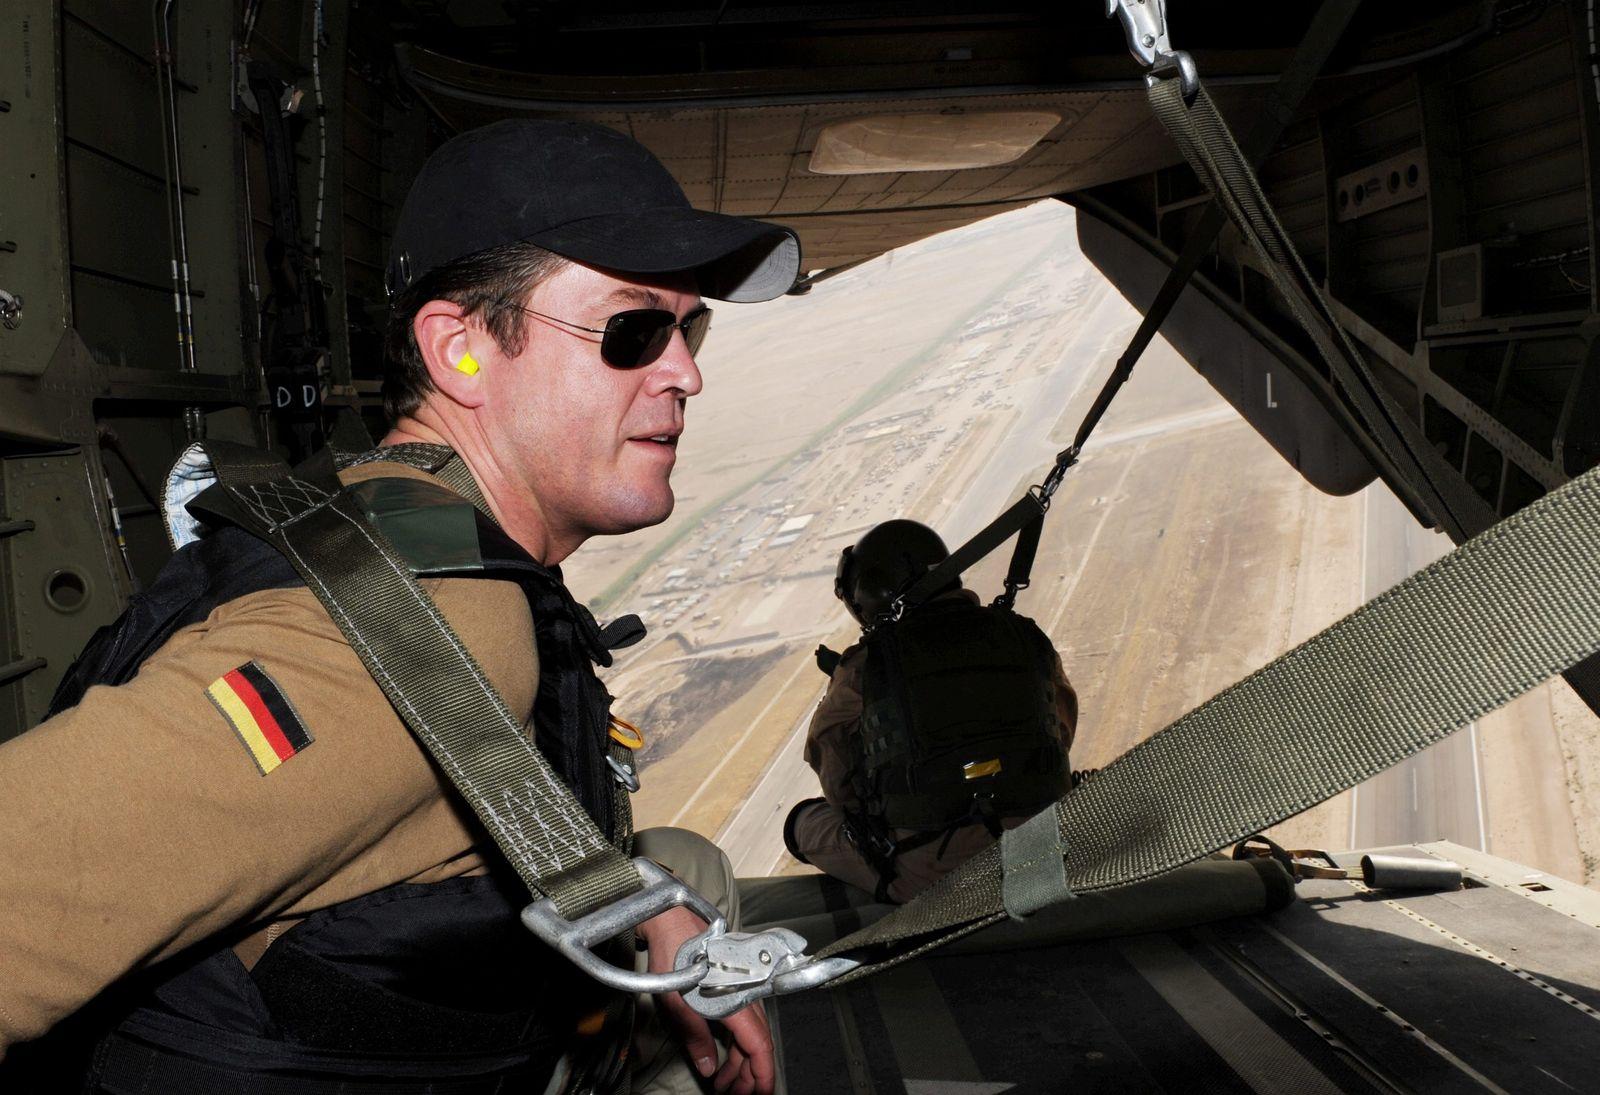 Guttenberg / Afghanistan